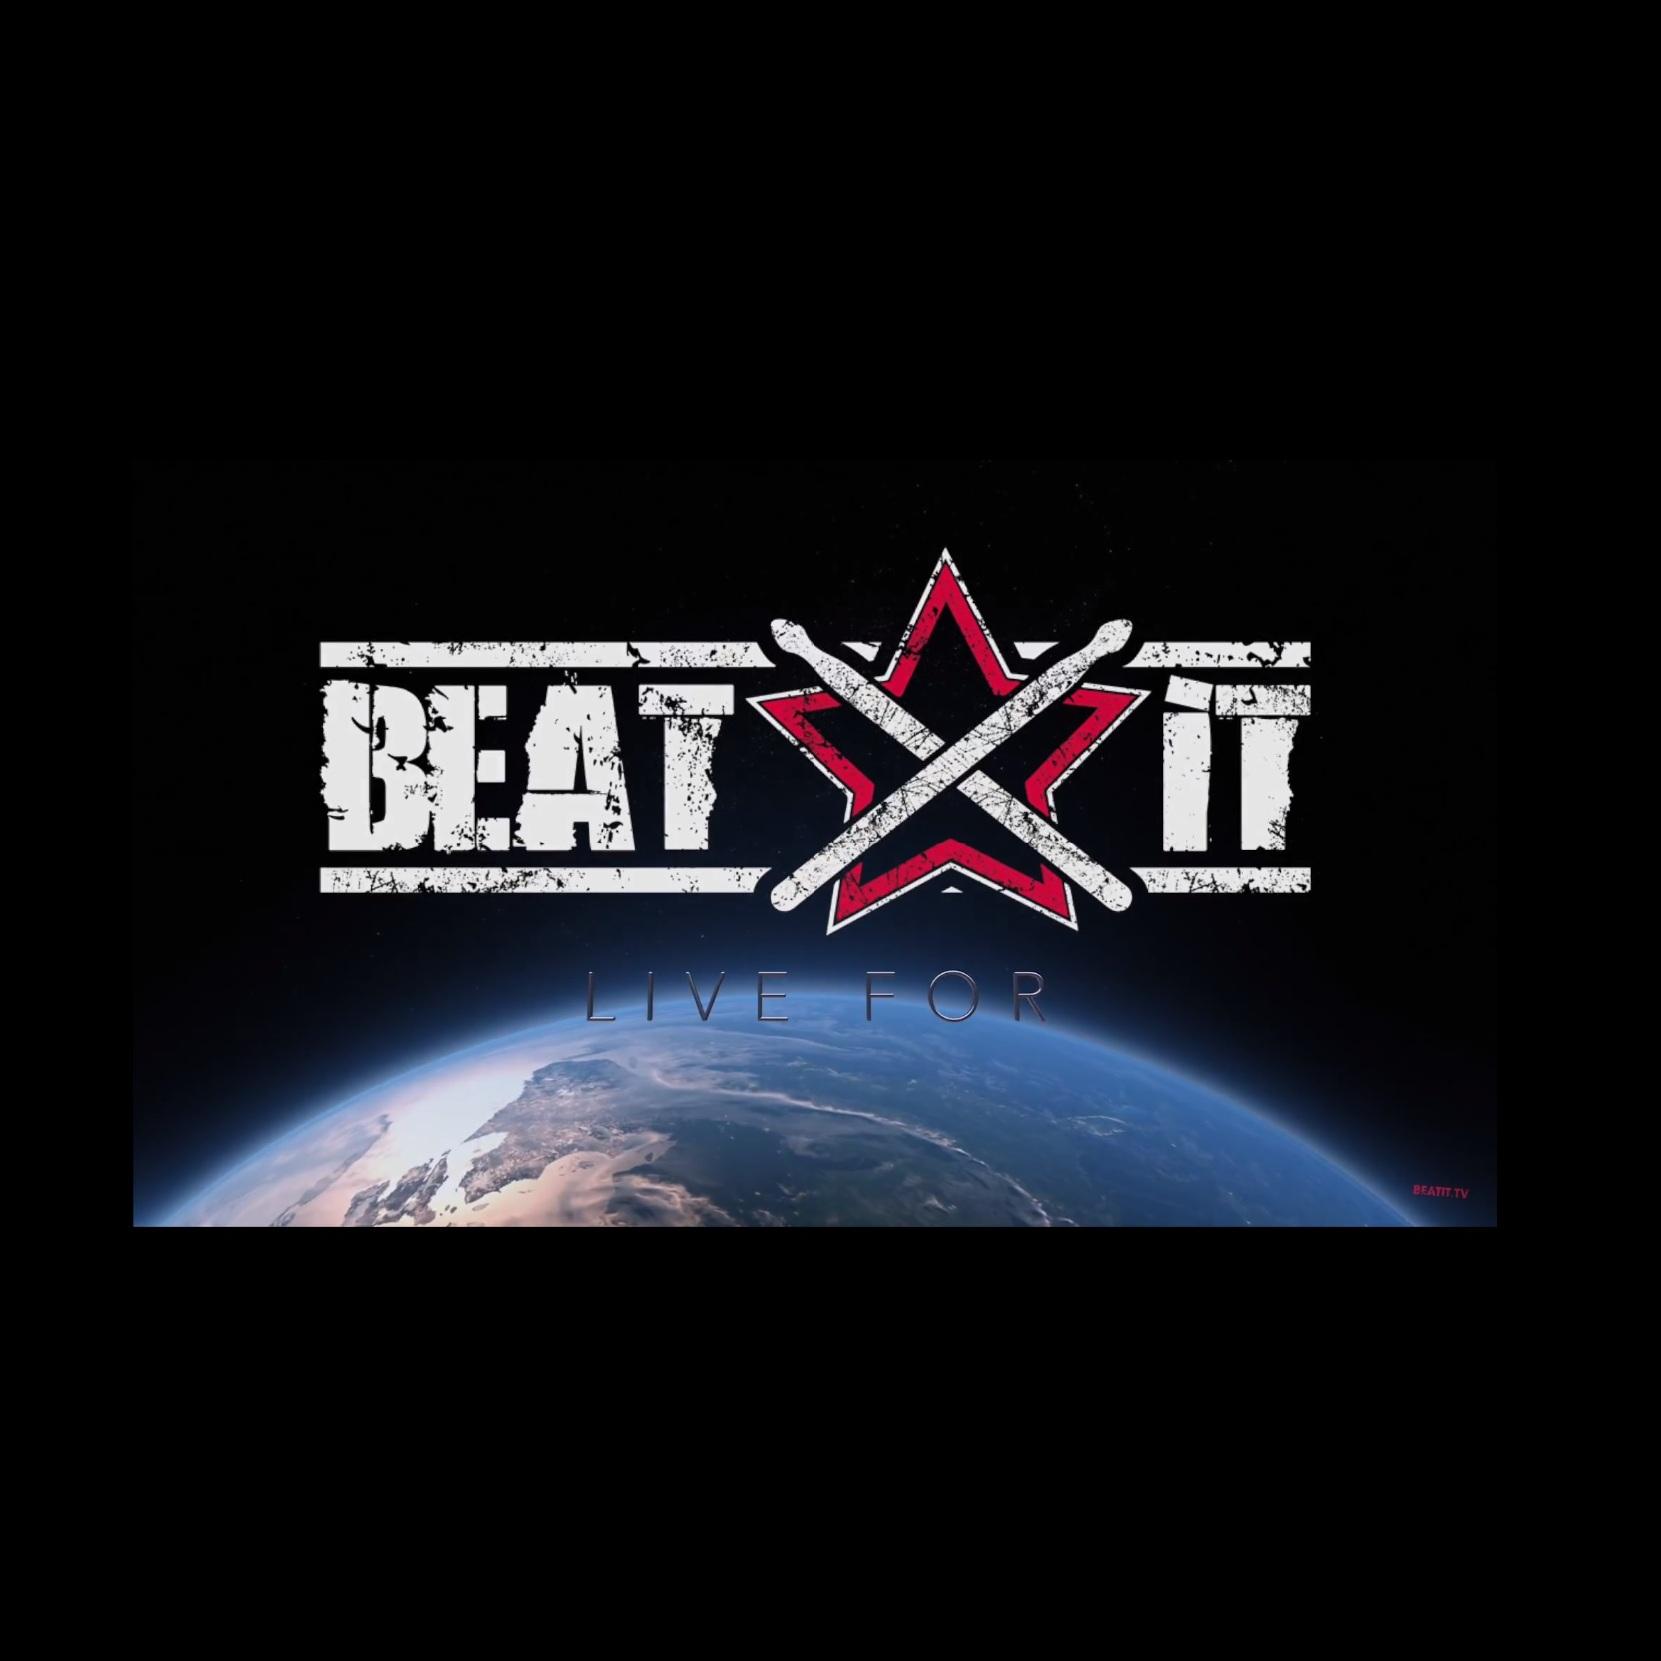 live beatit